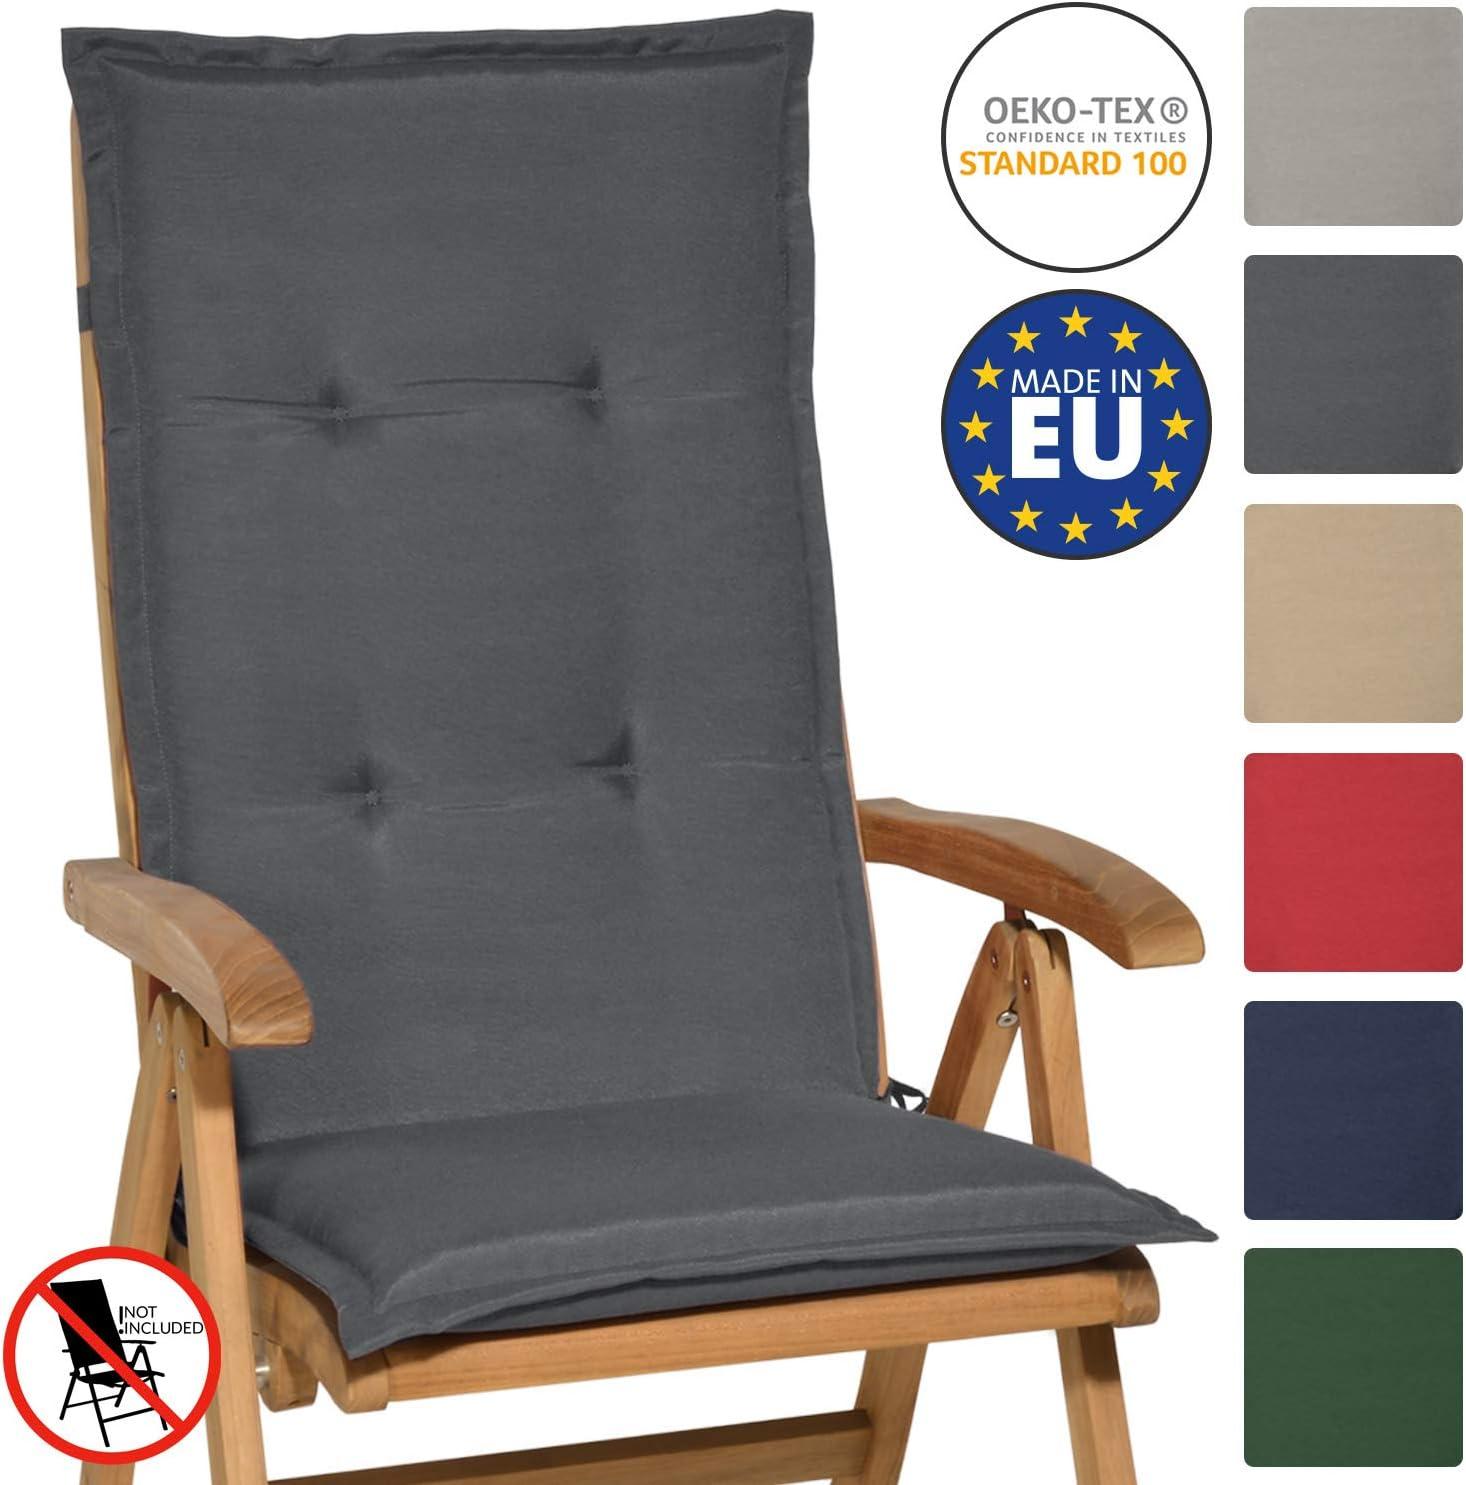 Beautissu Loft HL - Cojín para sillas de balcón o Asiento Exterior con Respaldo Alto - 120x50x6 cm - Placas compactas de gomaespuma - Gris Grafito